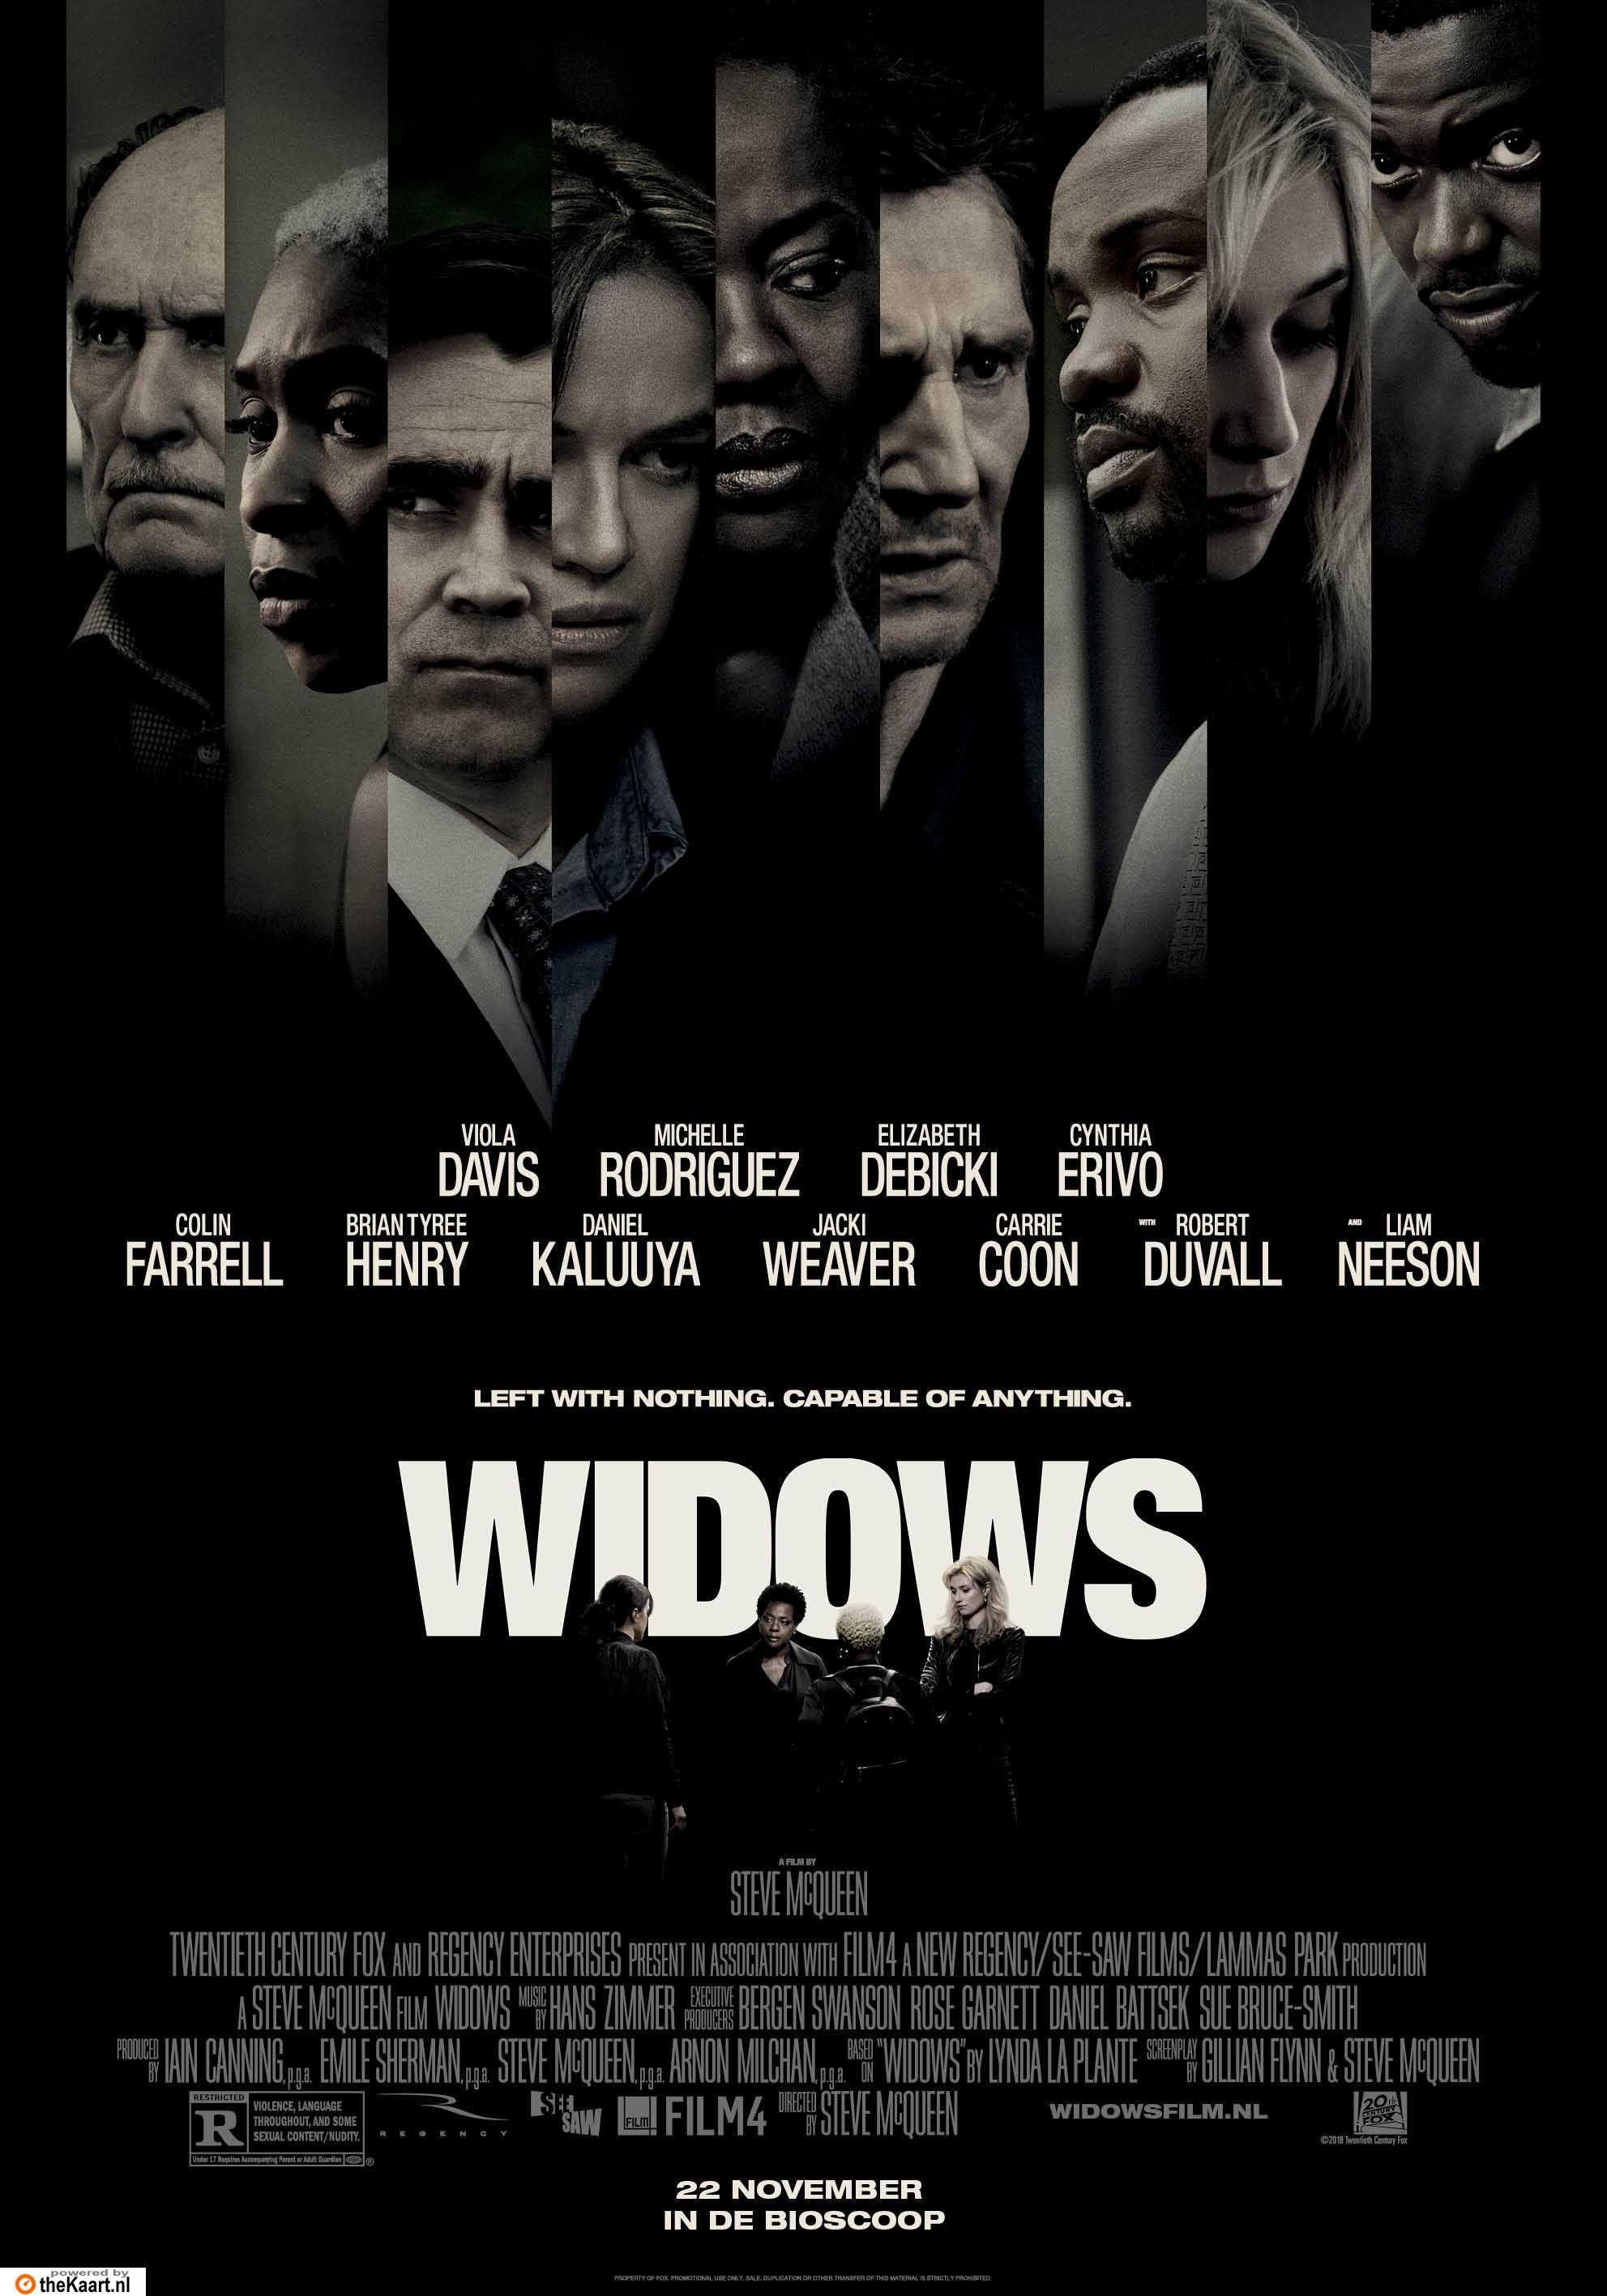 Widows poster, © 2018 20th Century Fox